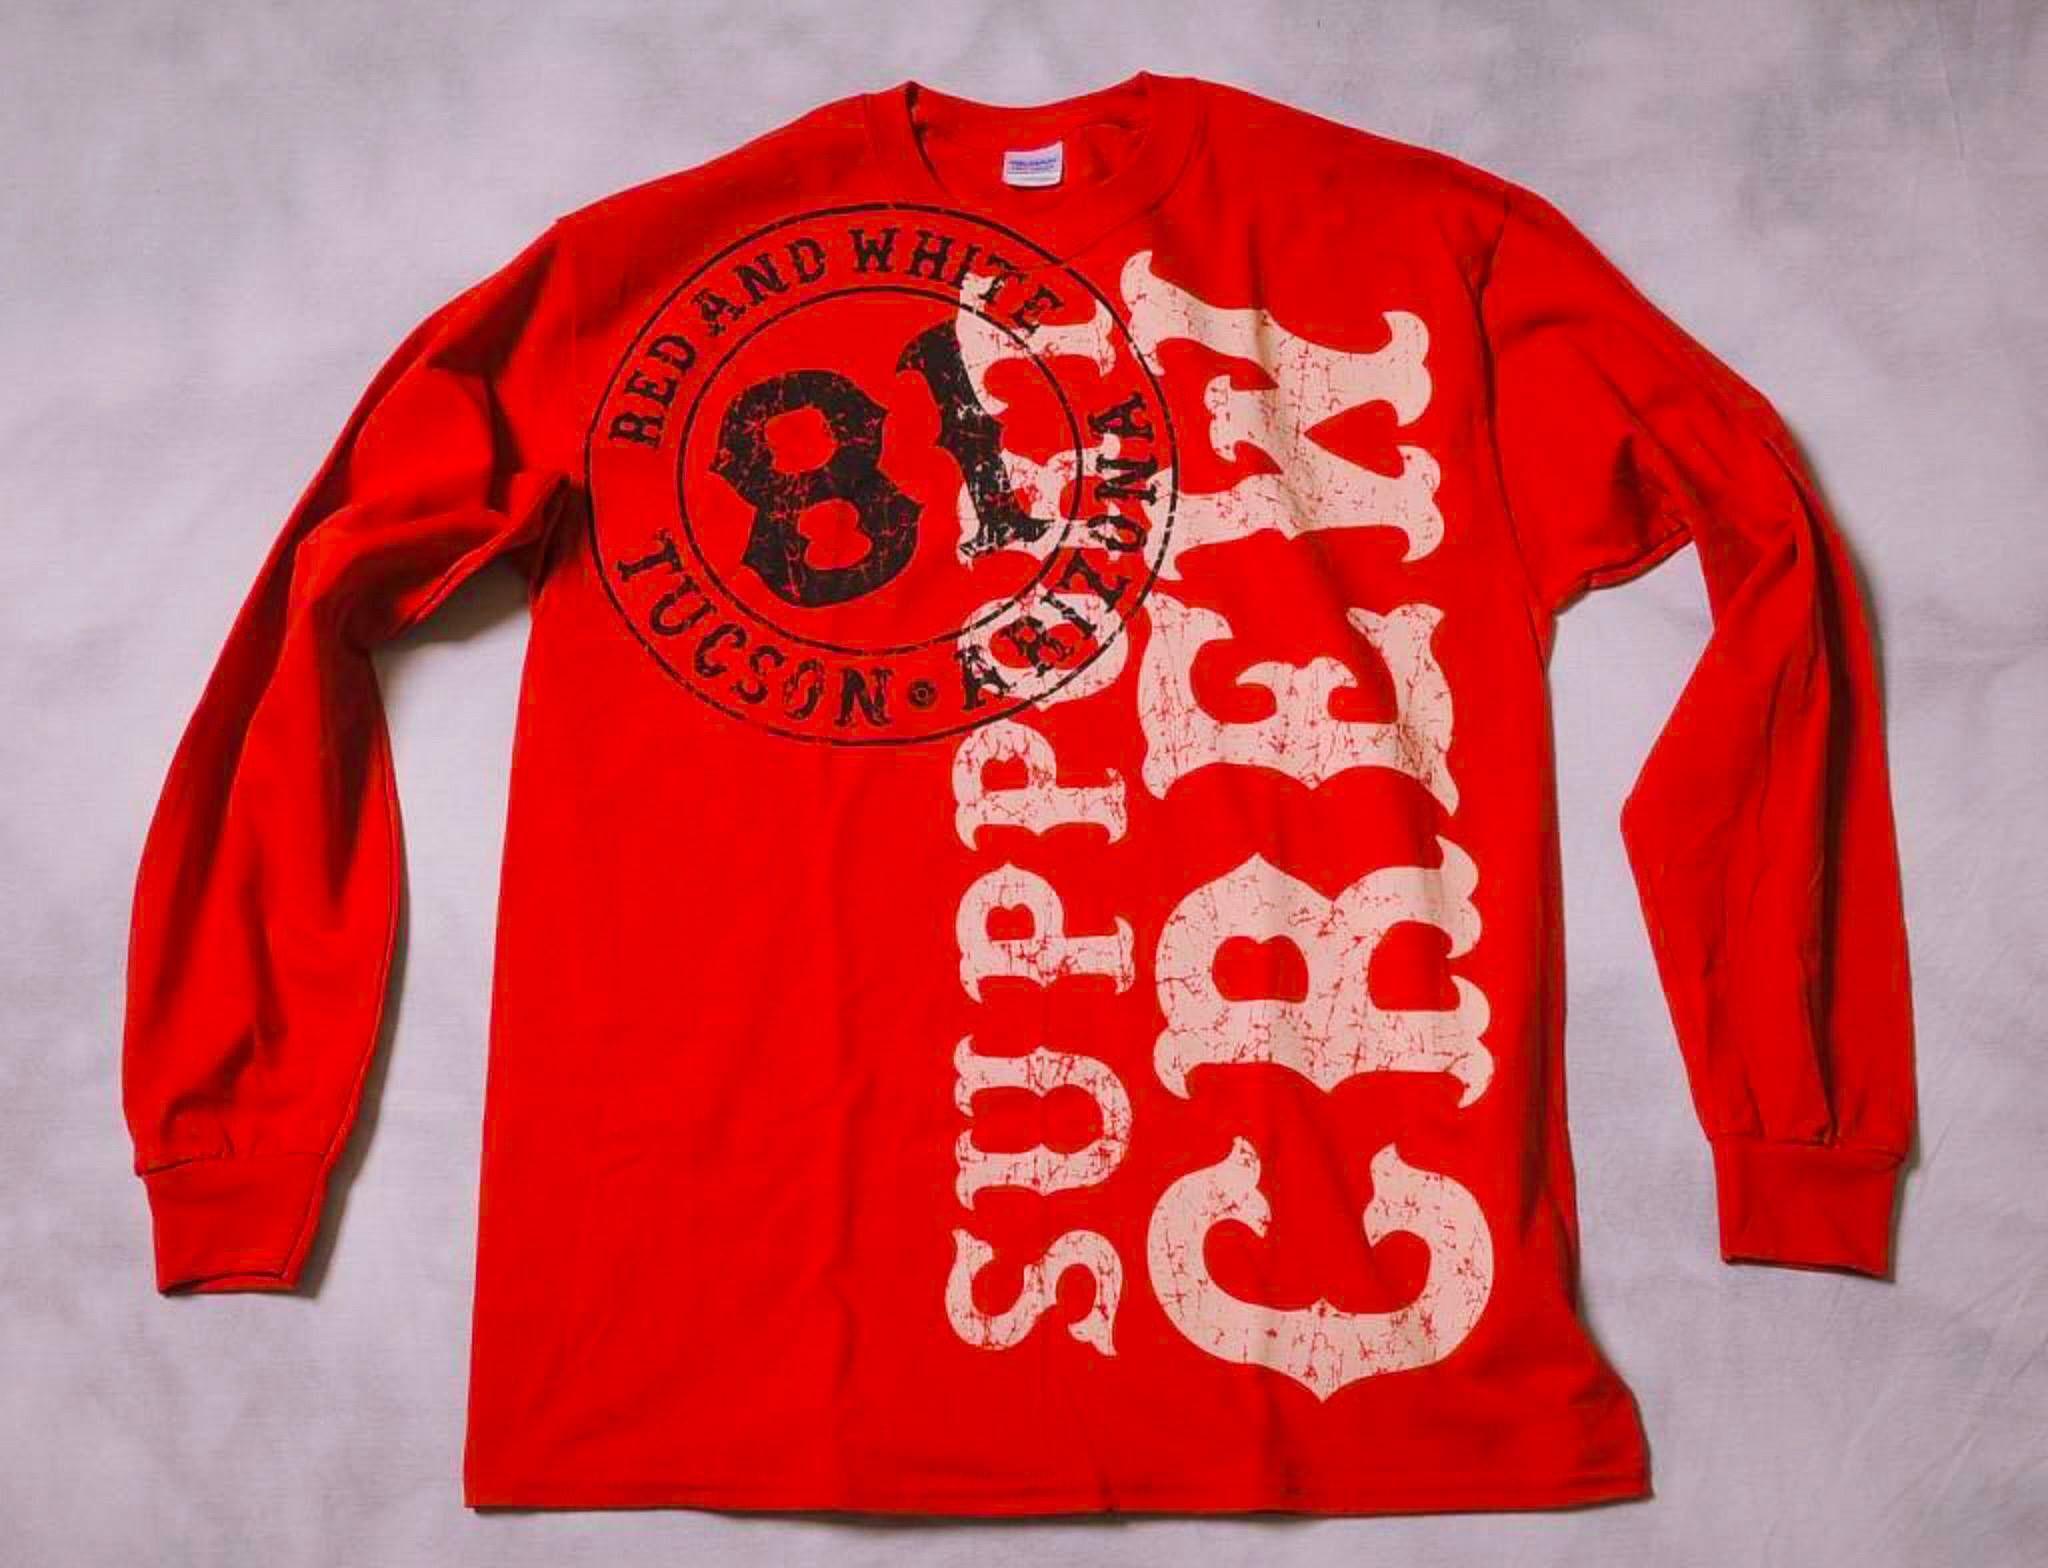 Pin by Carissa Padilla on 81 | Hells angels, T shirt, Christmas sweaters